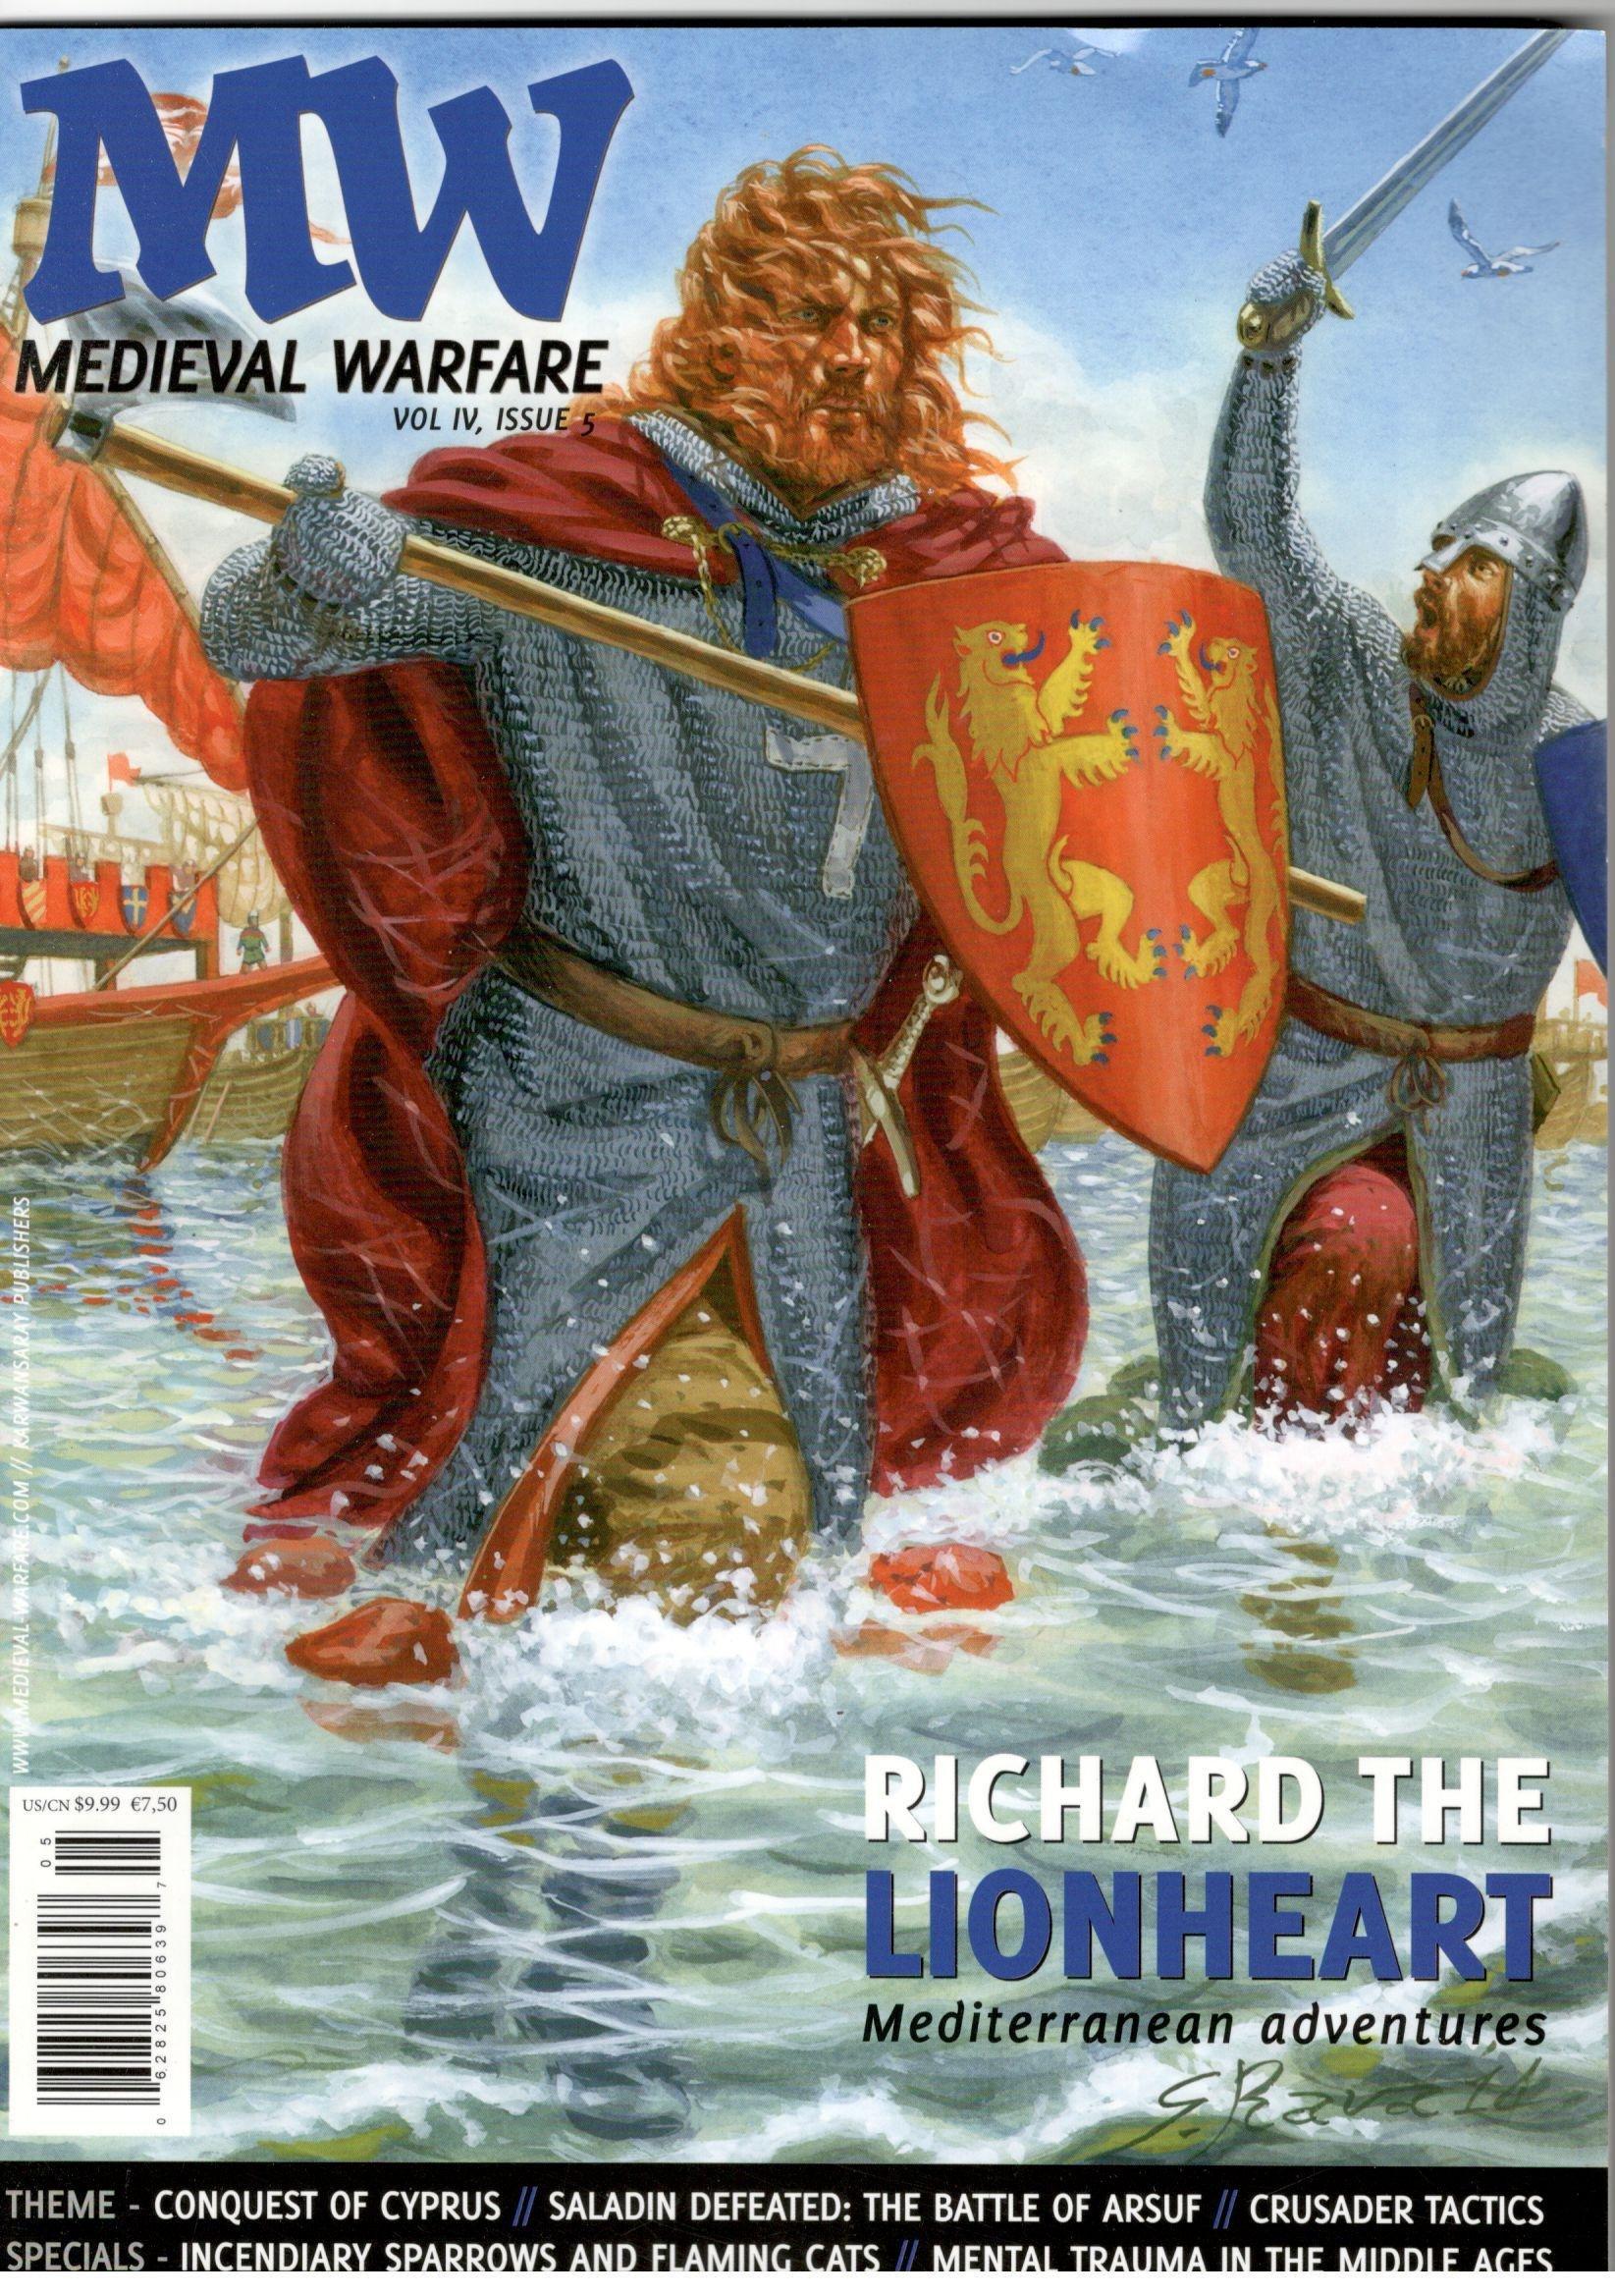 Medieval Warfare Magazine (Volume 6 # 5,Richard the Lionheart) ebook